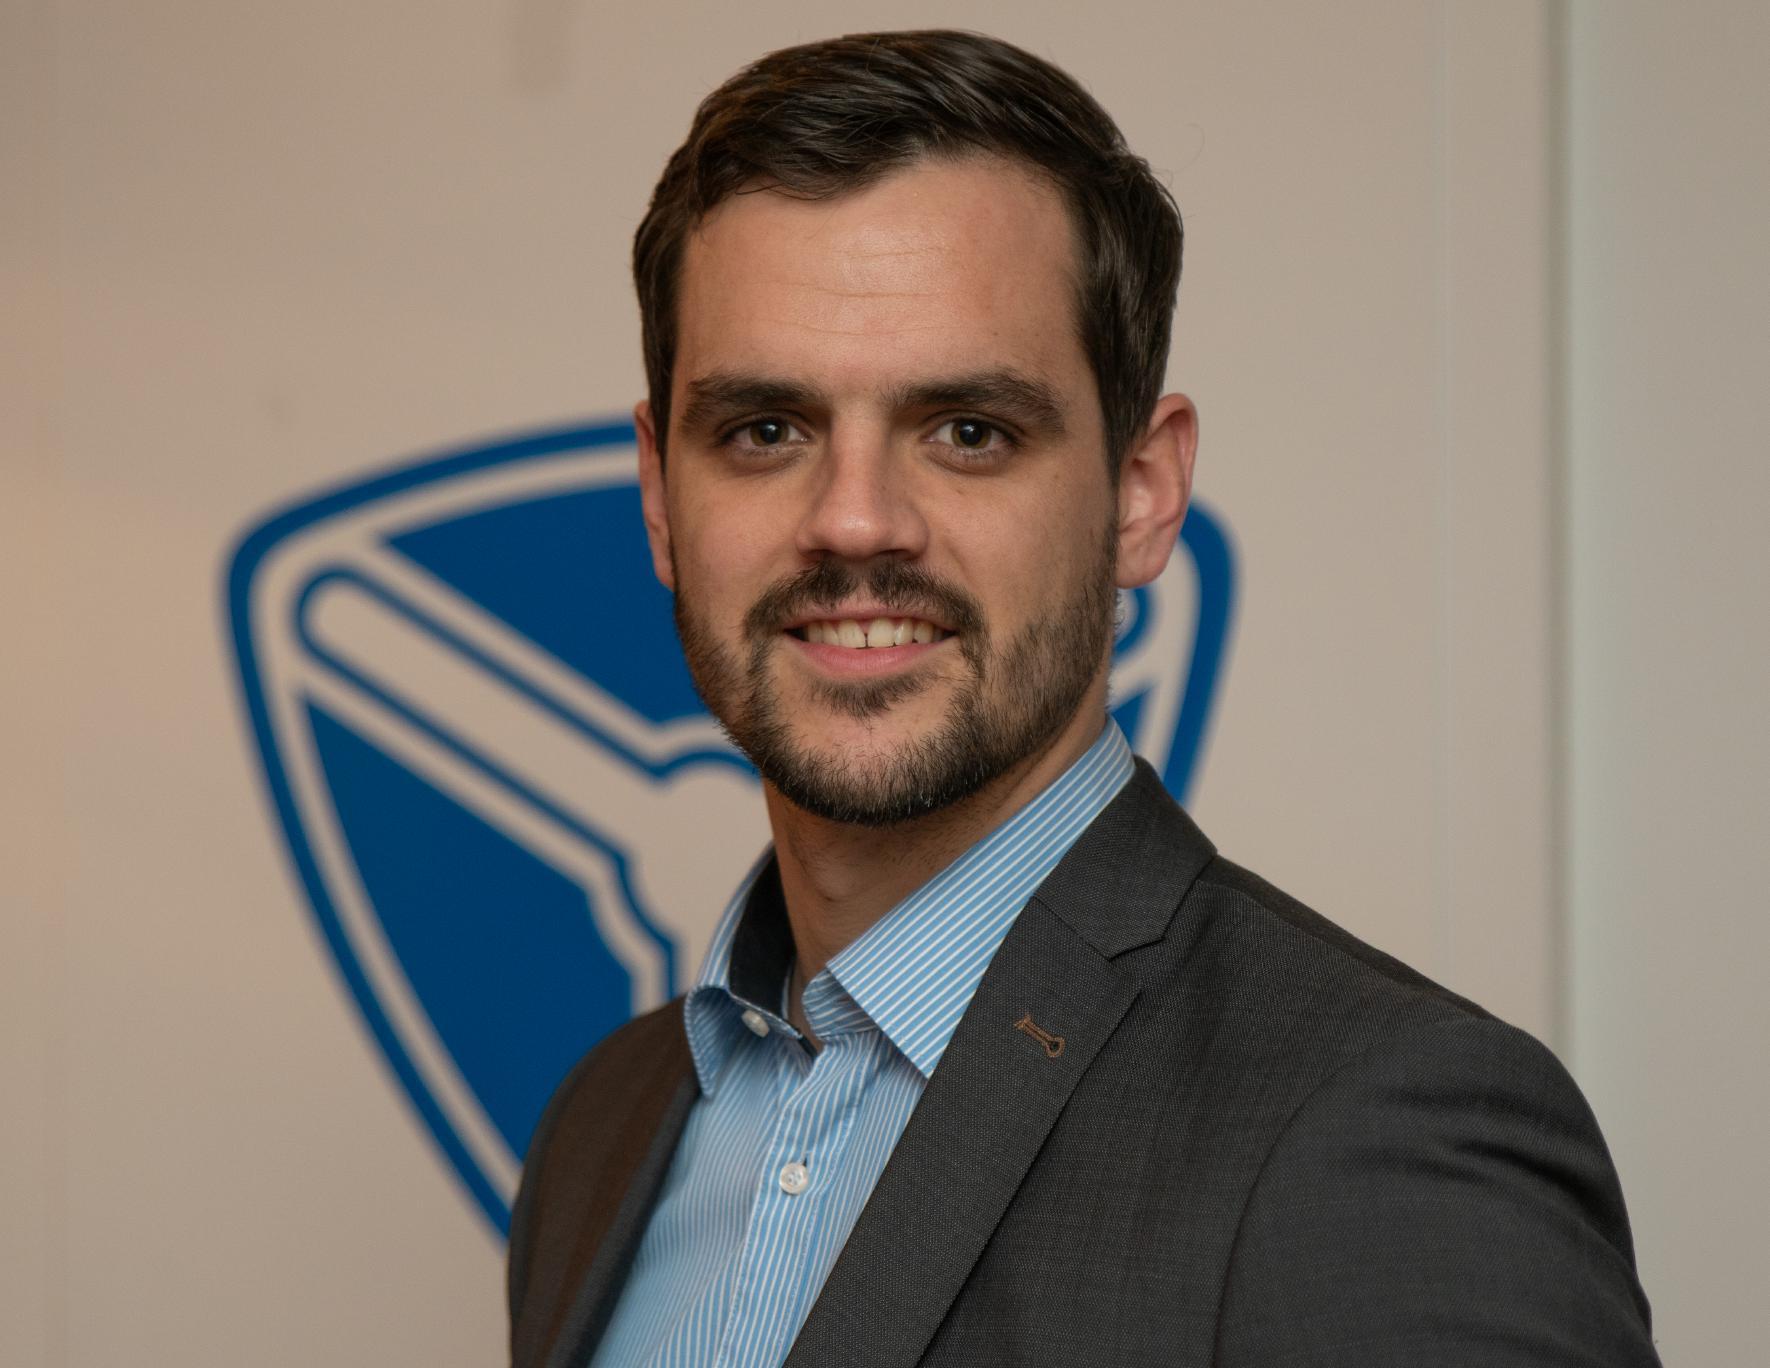 Lucas Leppin Beirat TTK Tobtaubenklub Sachsenwald Wohltorf